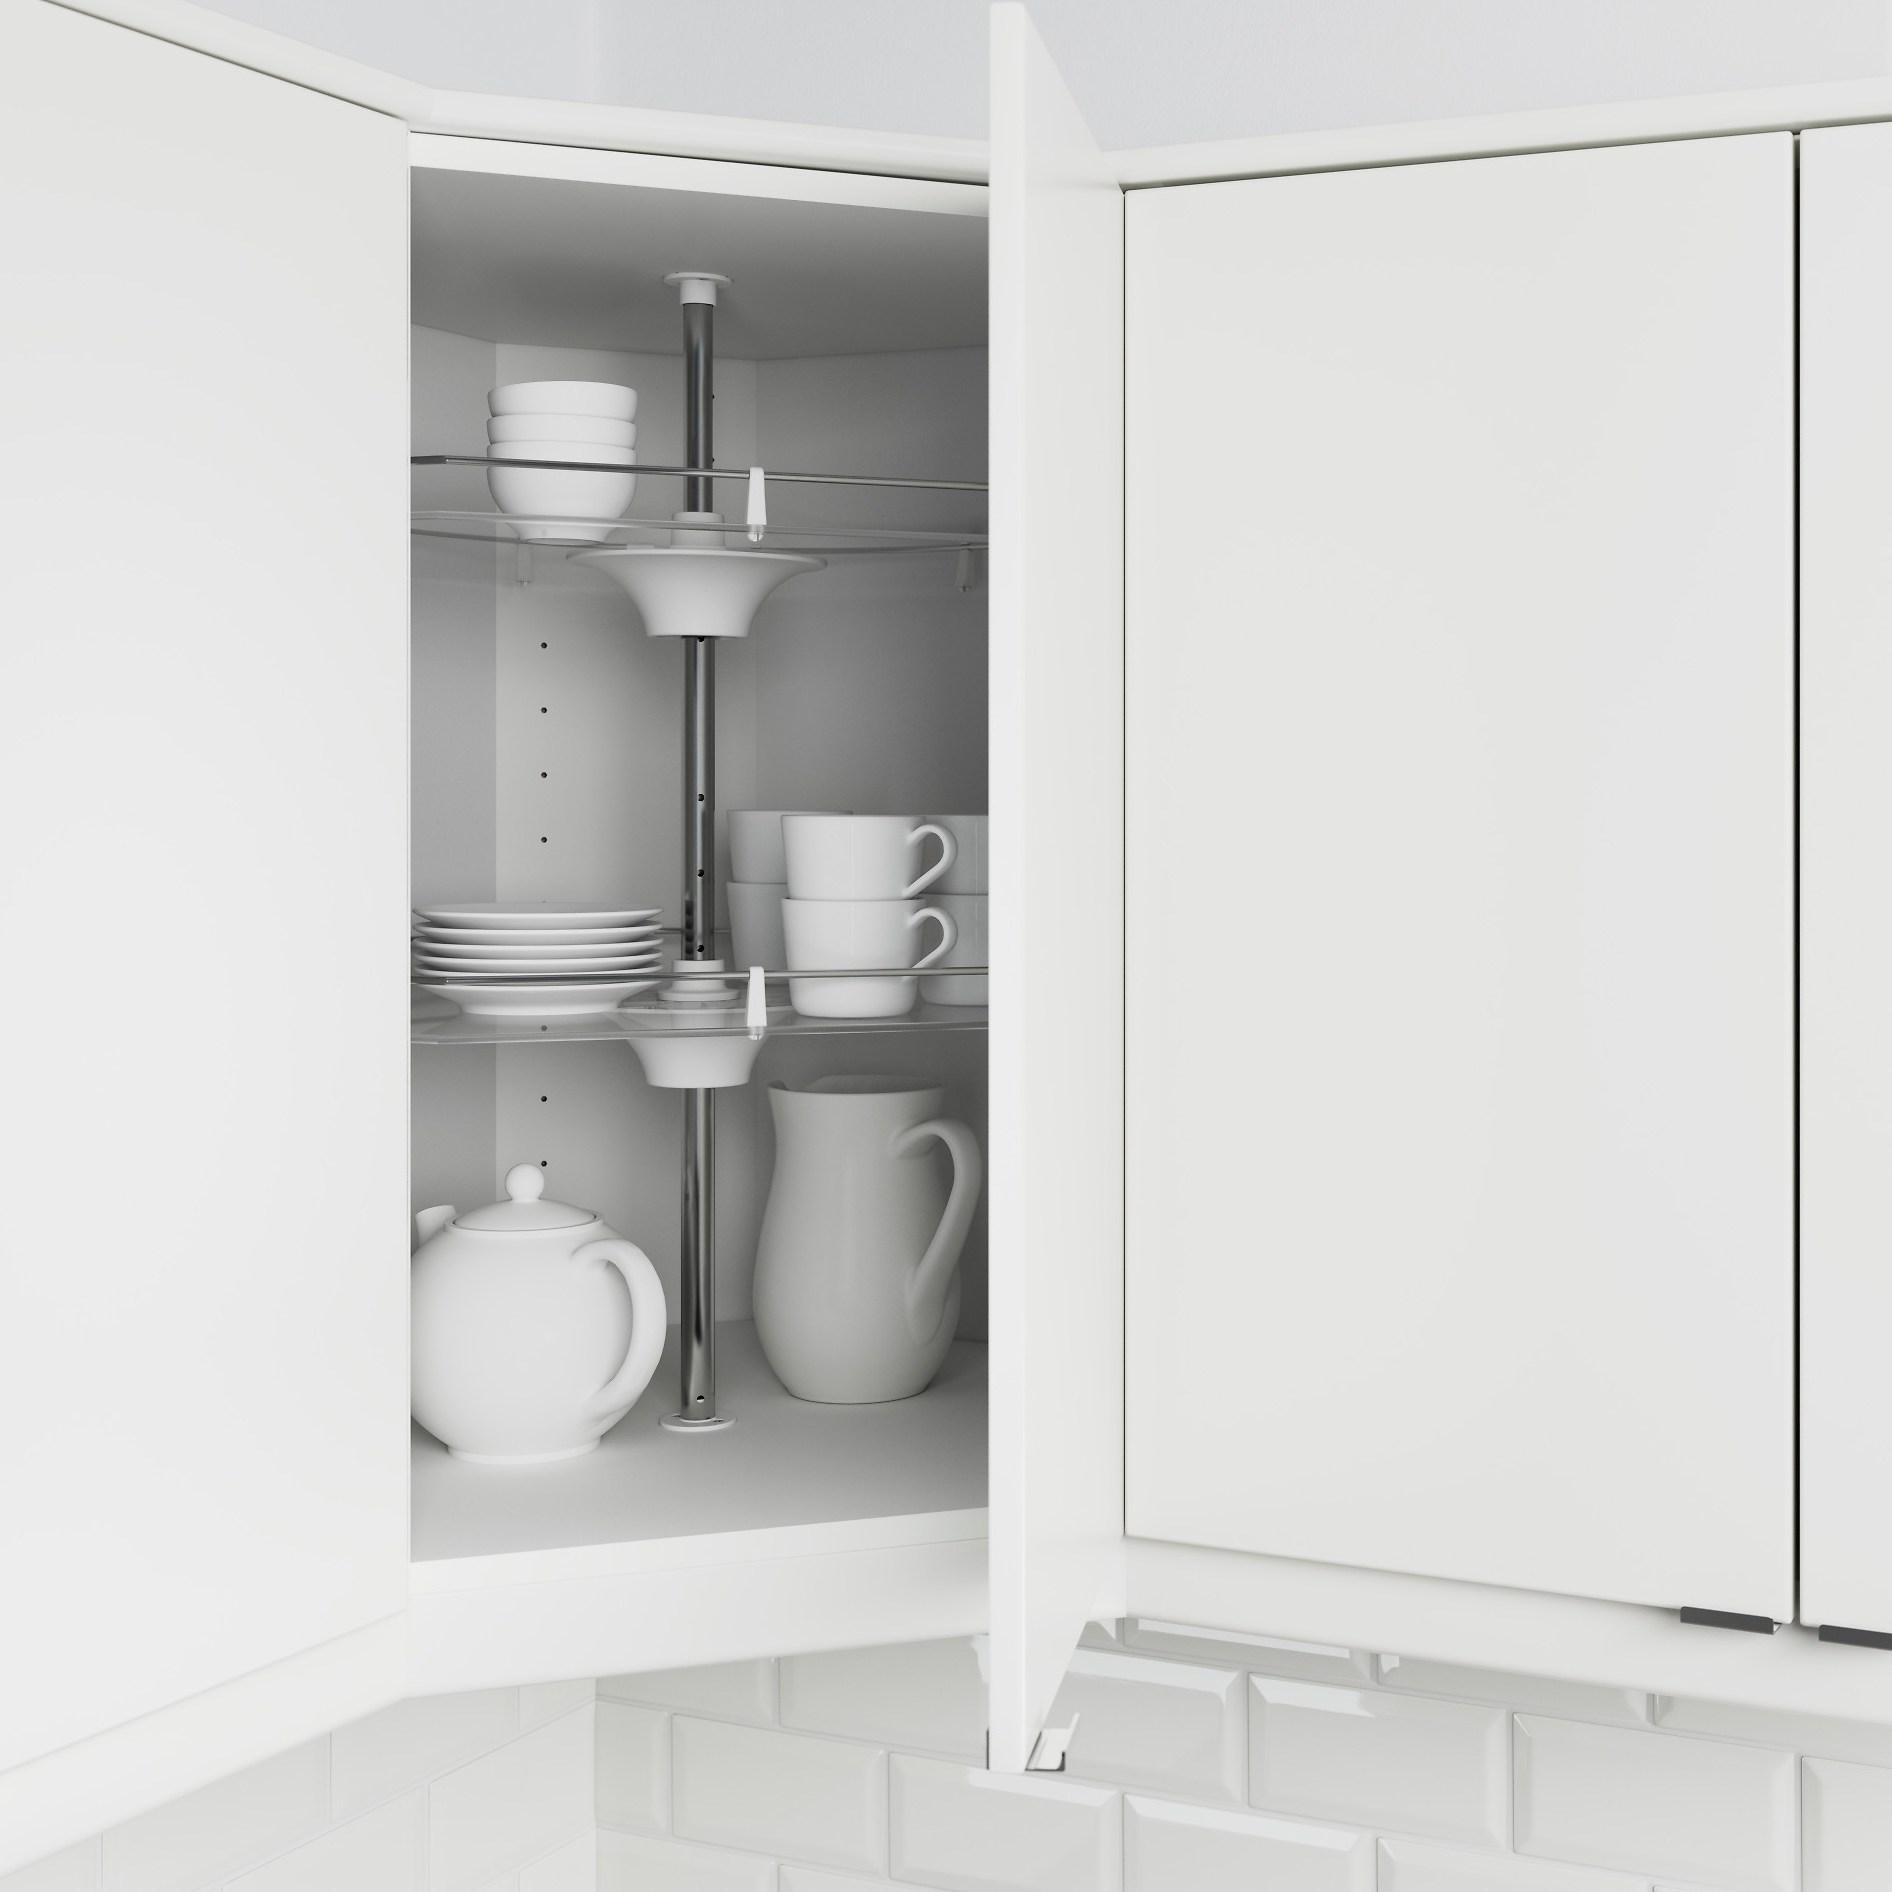 Ikea Hoekkasten 34 Fotos Pax Model Voor Kleding Witte